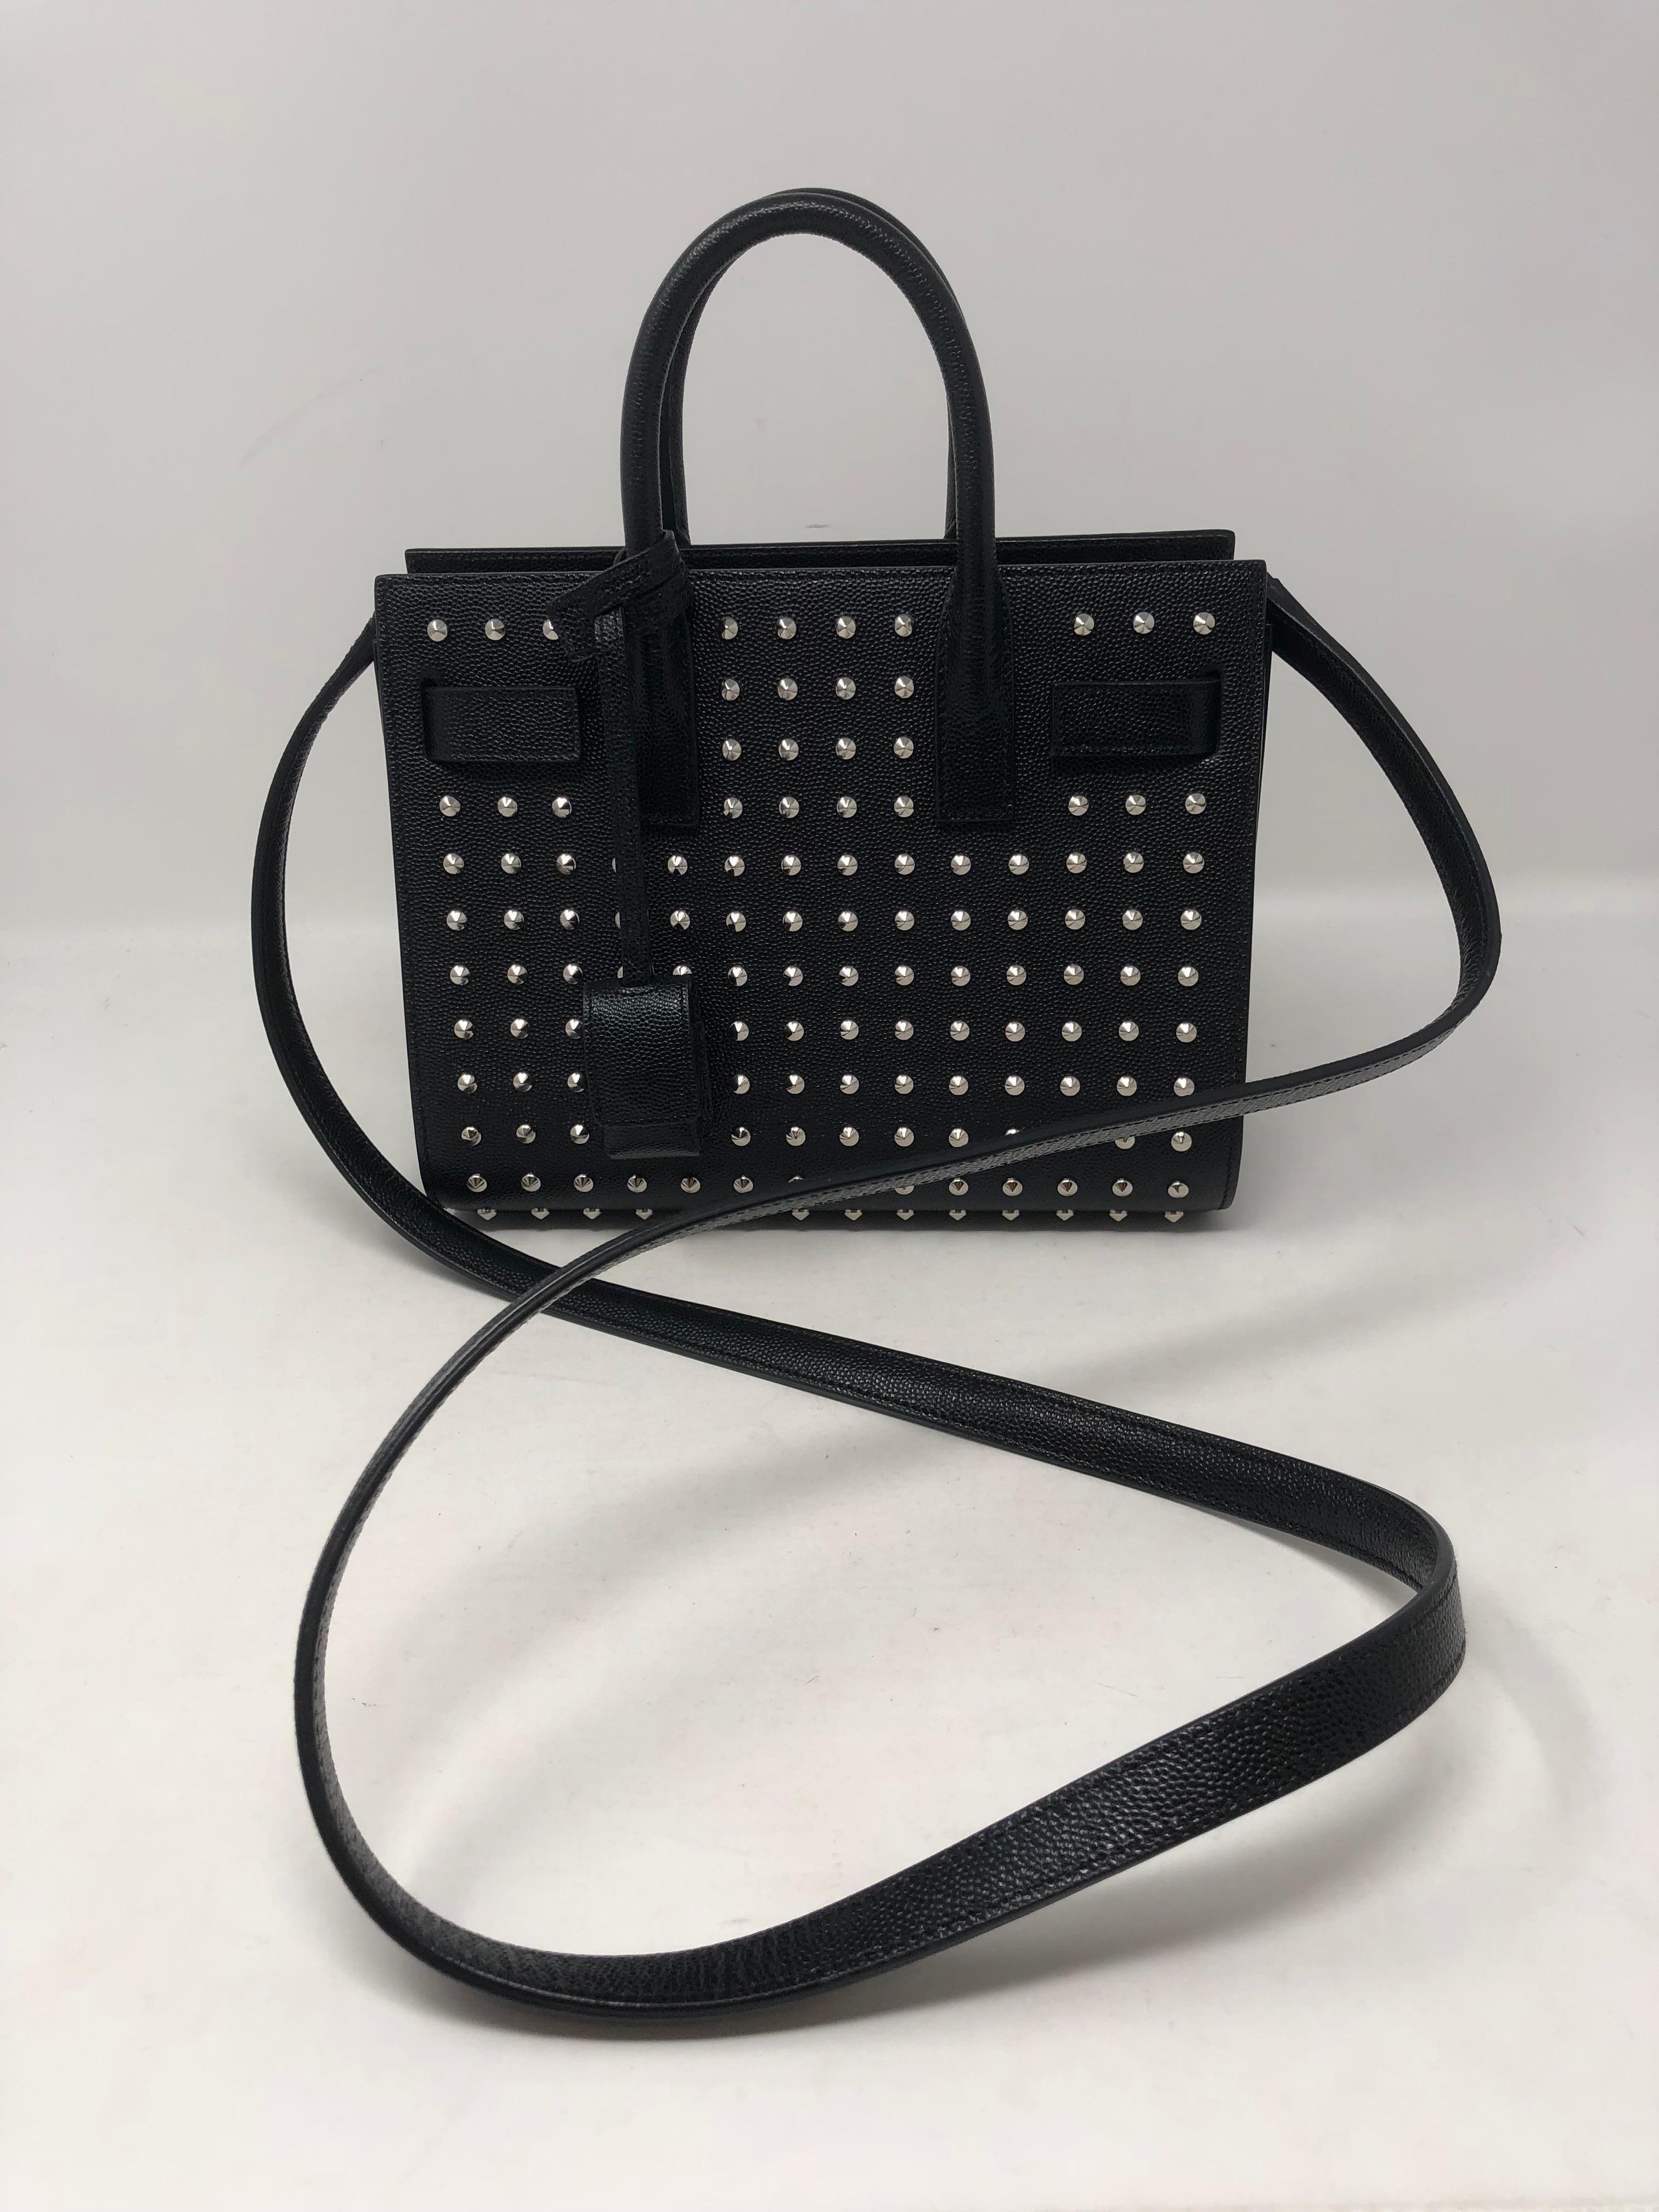 6a4fe2d1ebd Yves Saint Laurent Black Studded Nano Sac Du Jour Bag at 1stdibs